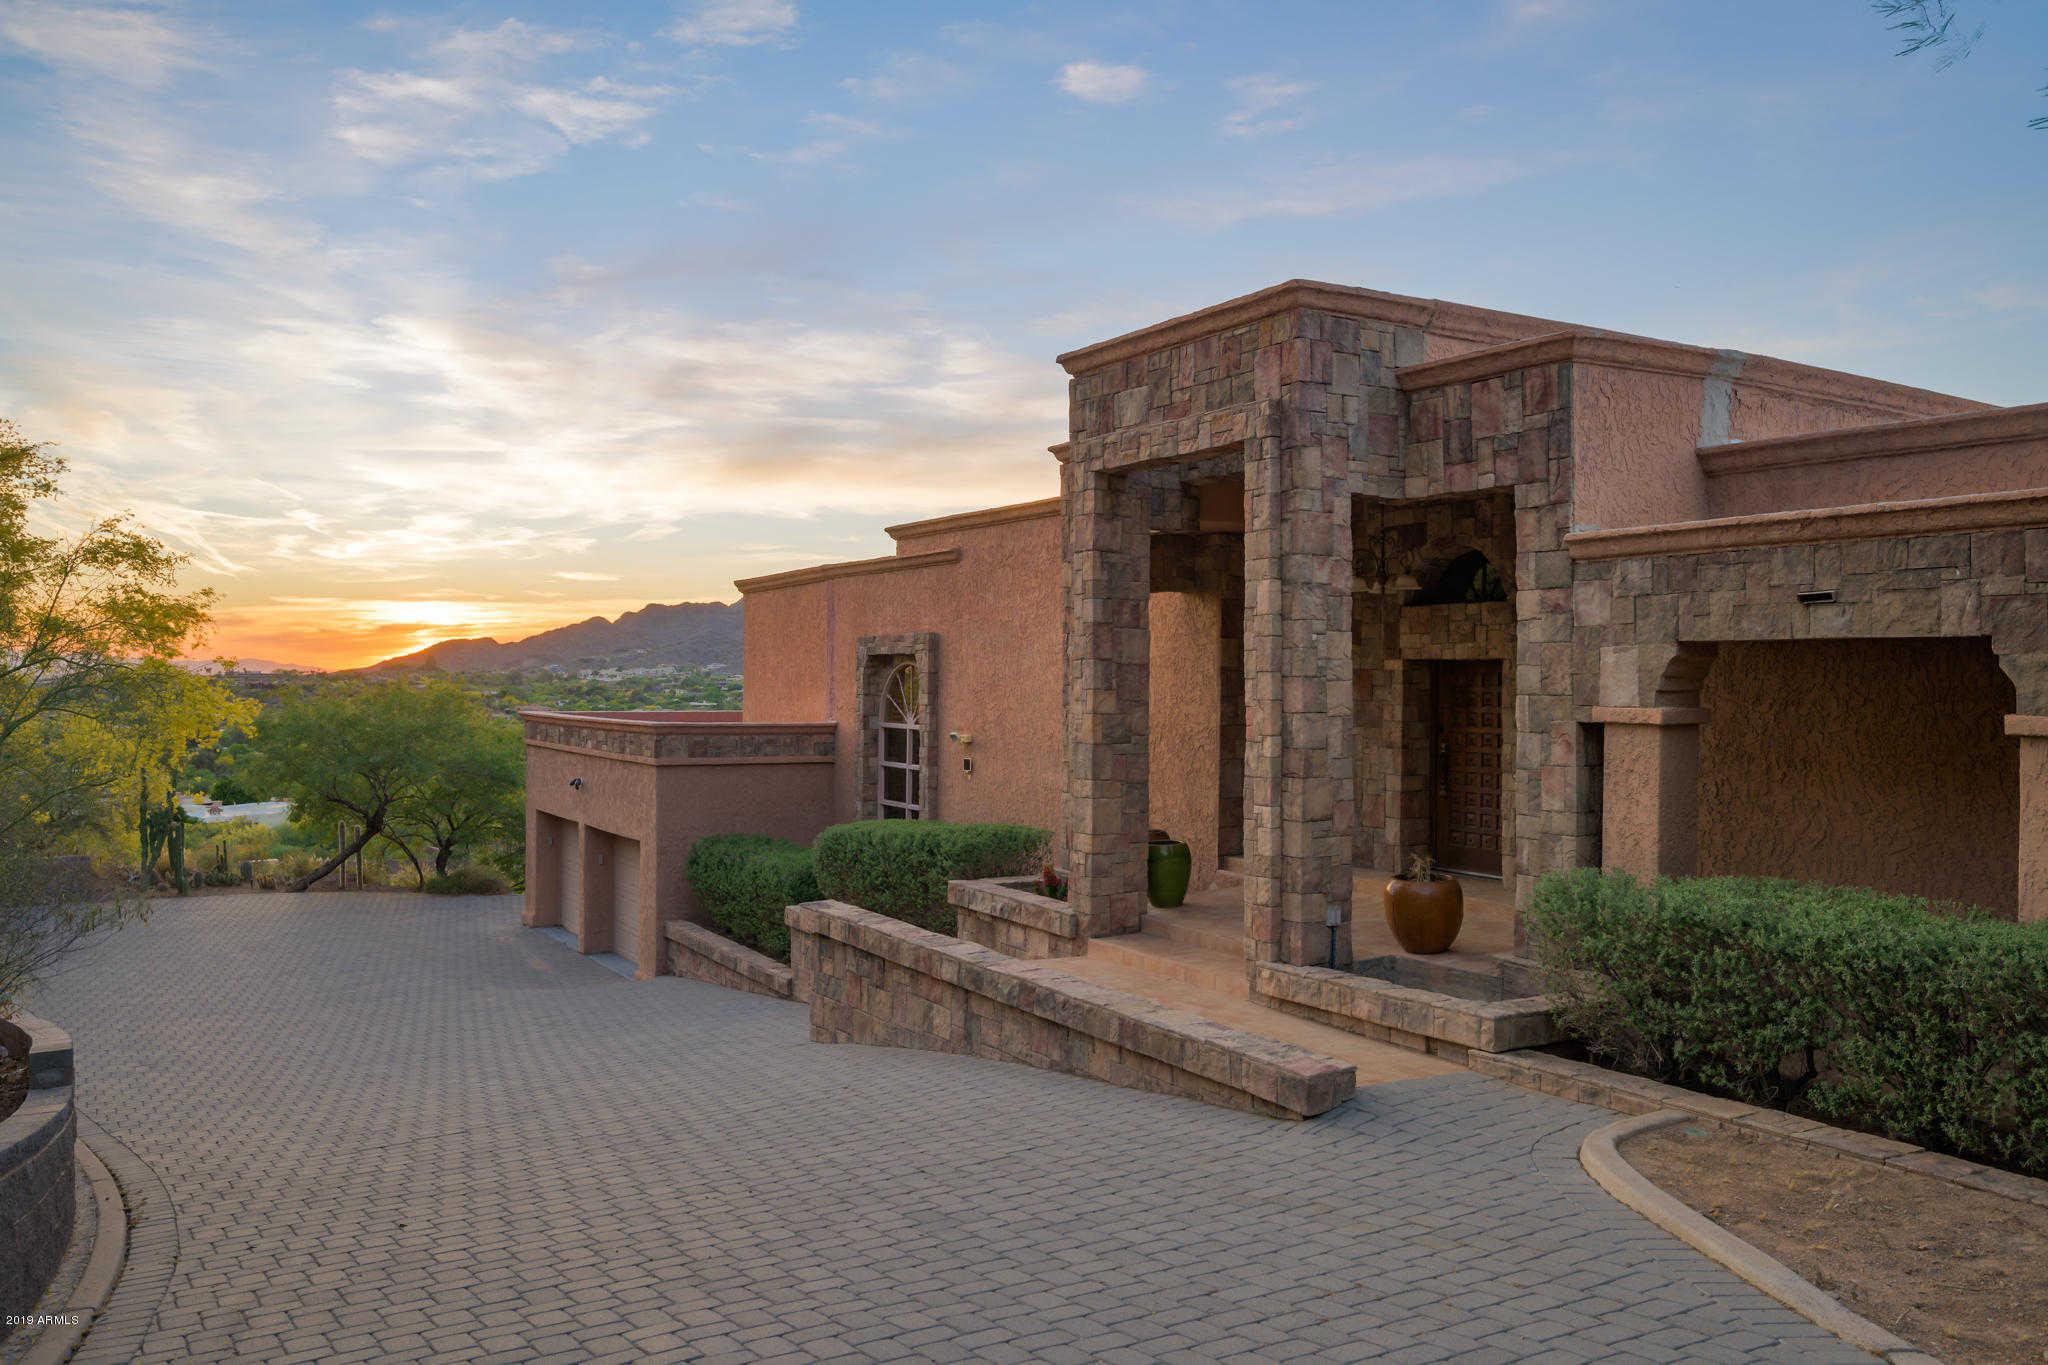 $1,300,000 - 3Br/3Ba - Home for Sale in Mirador, Paradise Valley